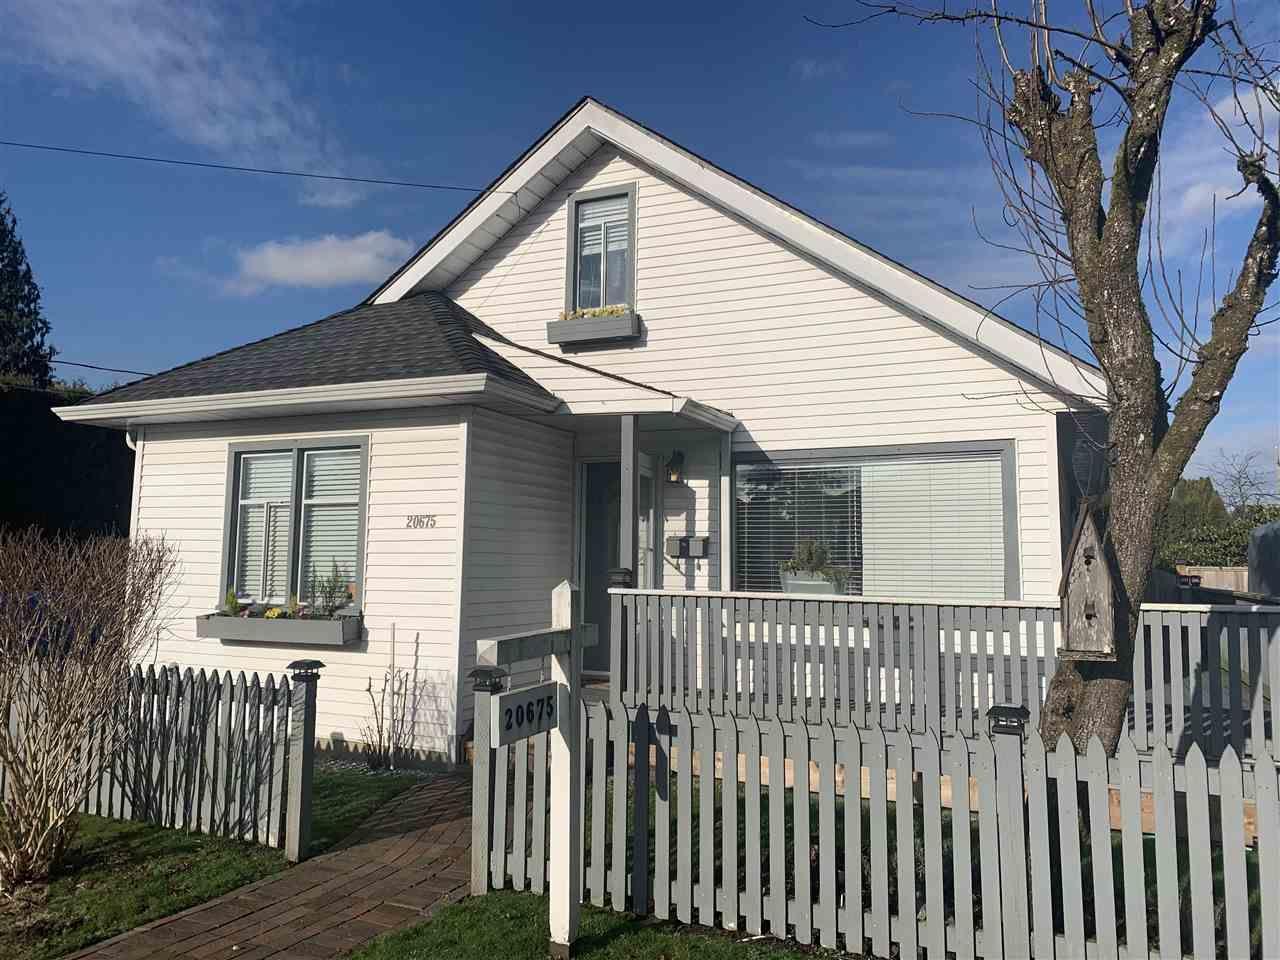 Main Photo: 20675 LORNE Avenue in Maple Ridge: Southwest Maple Ridge House for sale : MLS®# R2534798